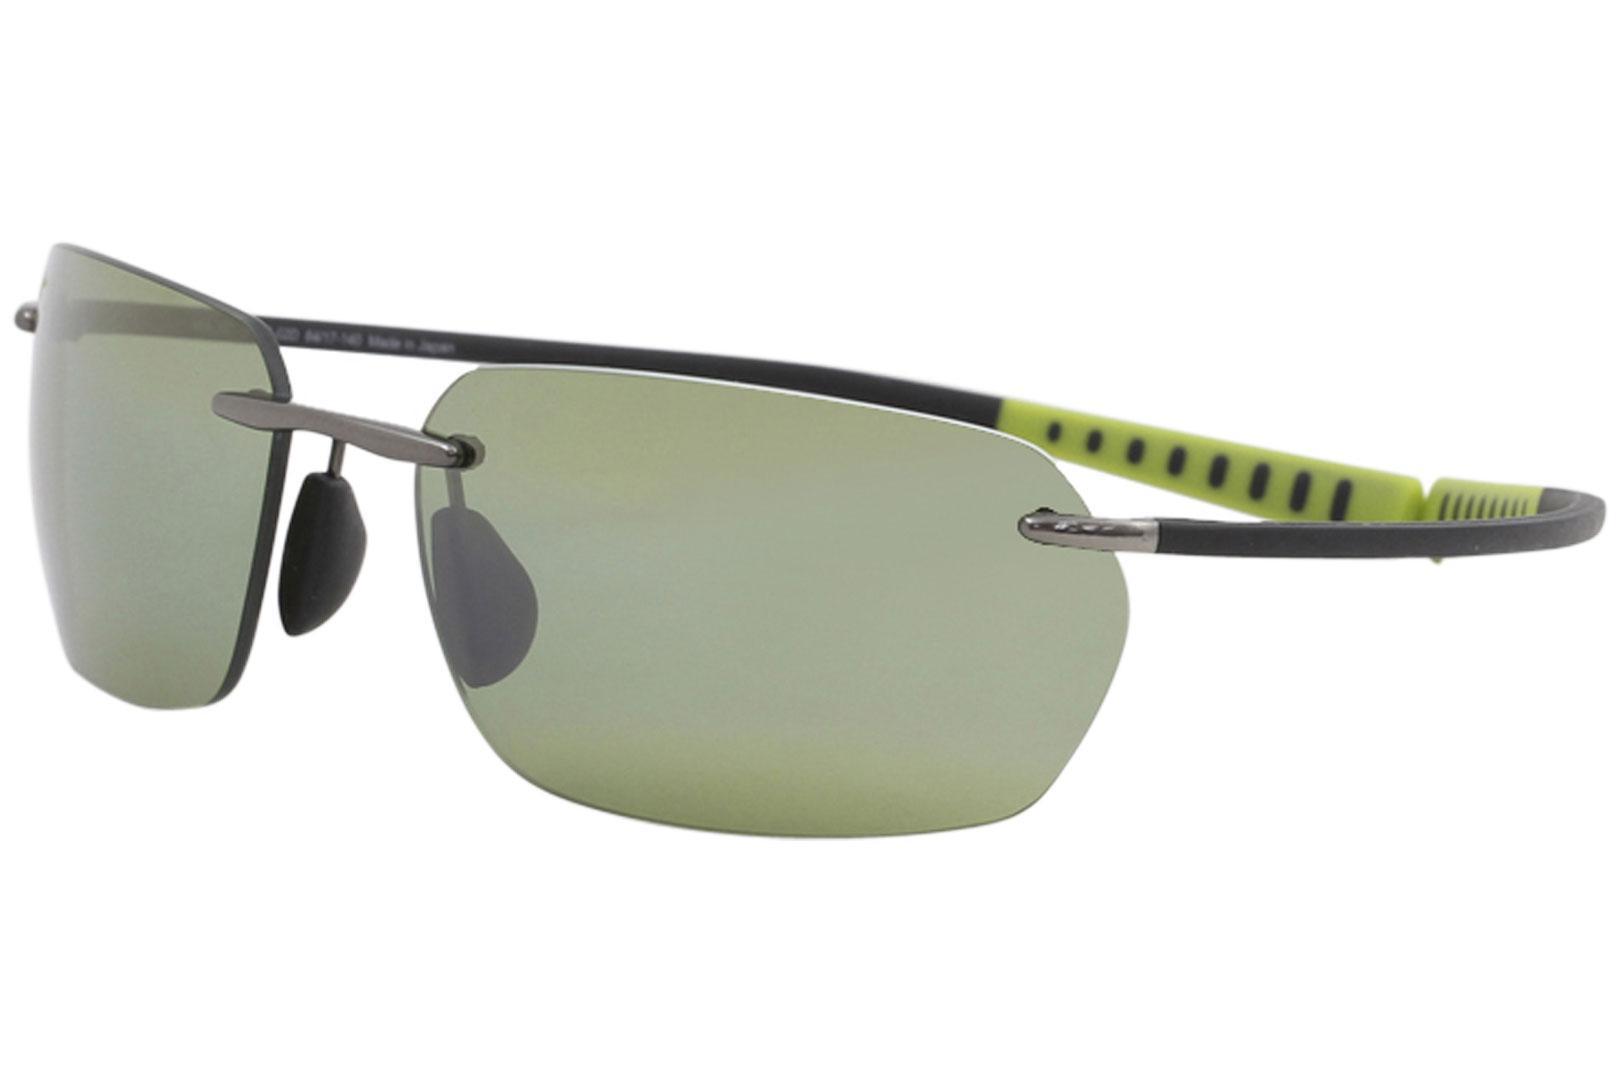 e3921bfe12 Maui Jim Men s Alakai i MJ743 MJ 743 Fashion Rectangle Polarized Sunglasses